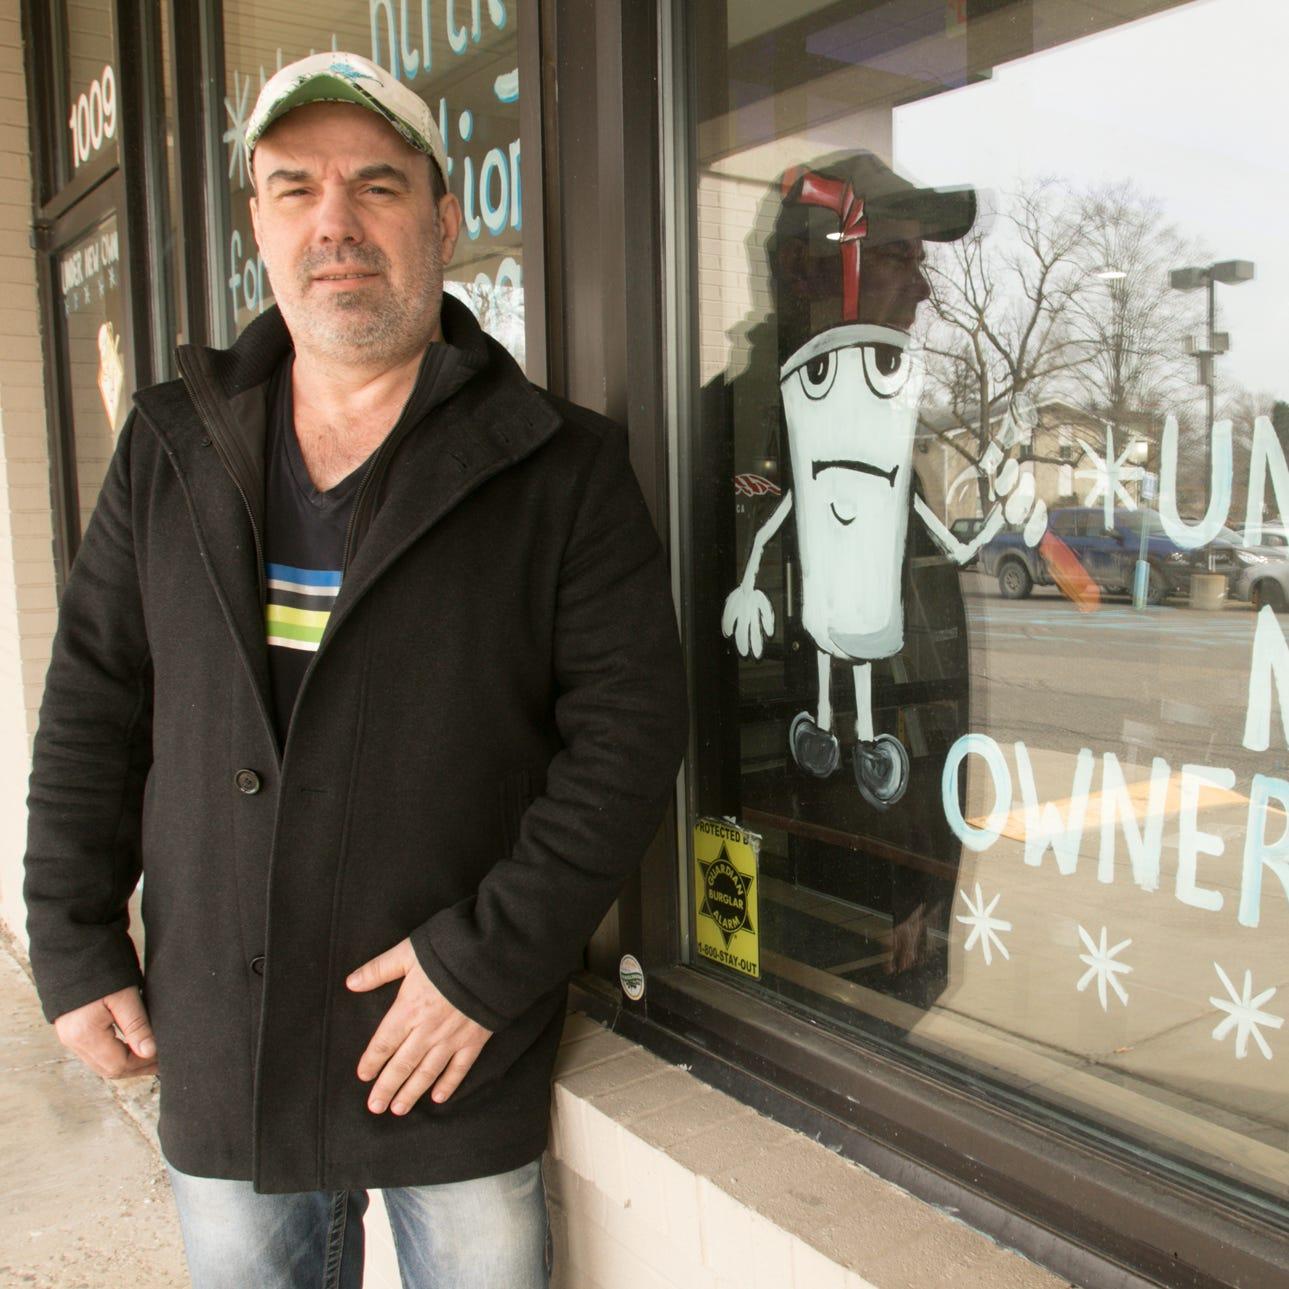 Coney comeback: Original owner buys back Brighton Coney Island restaurant